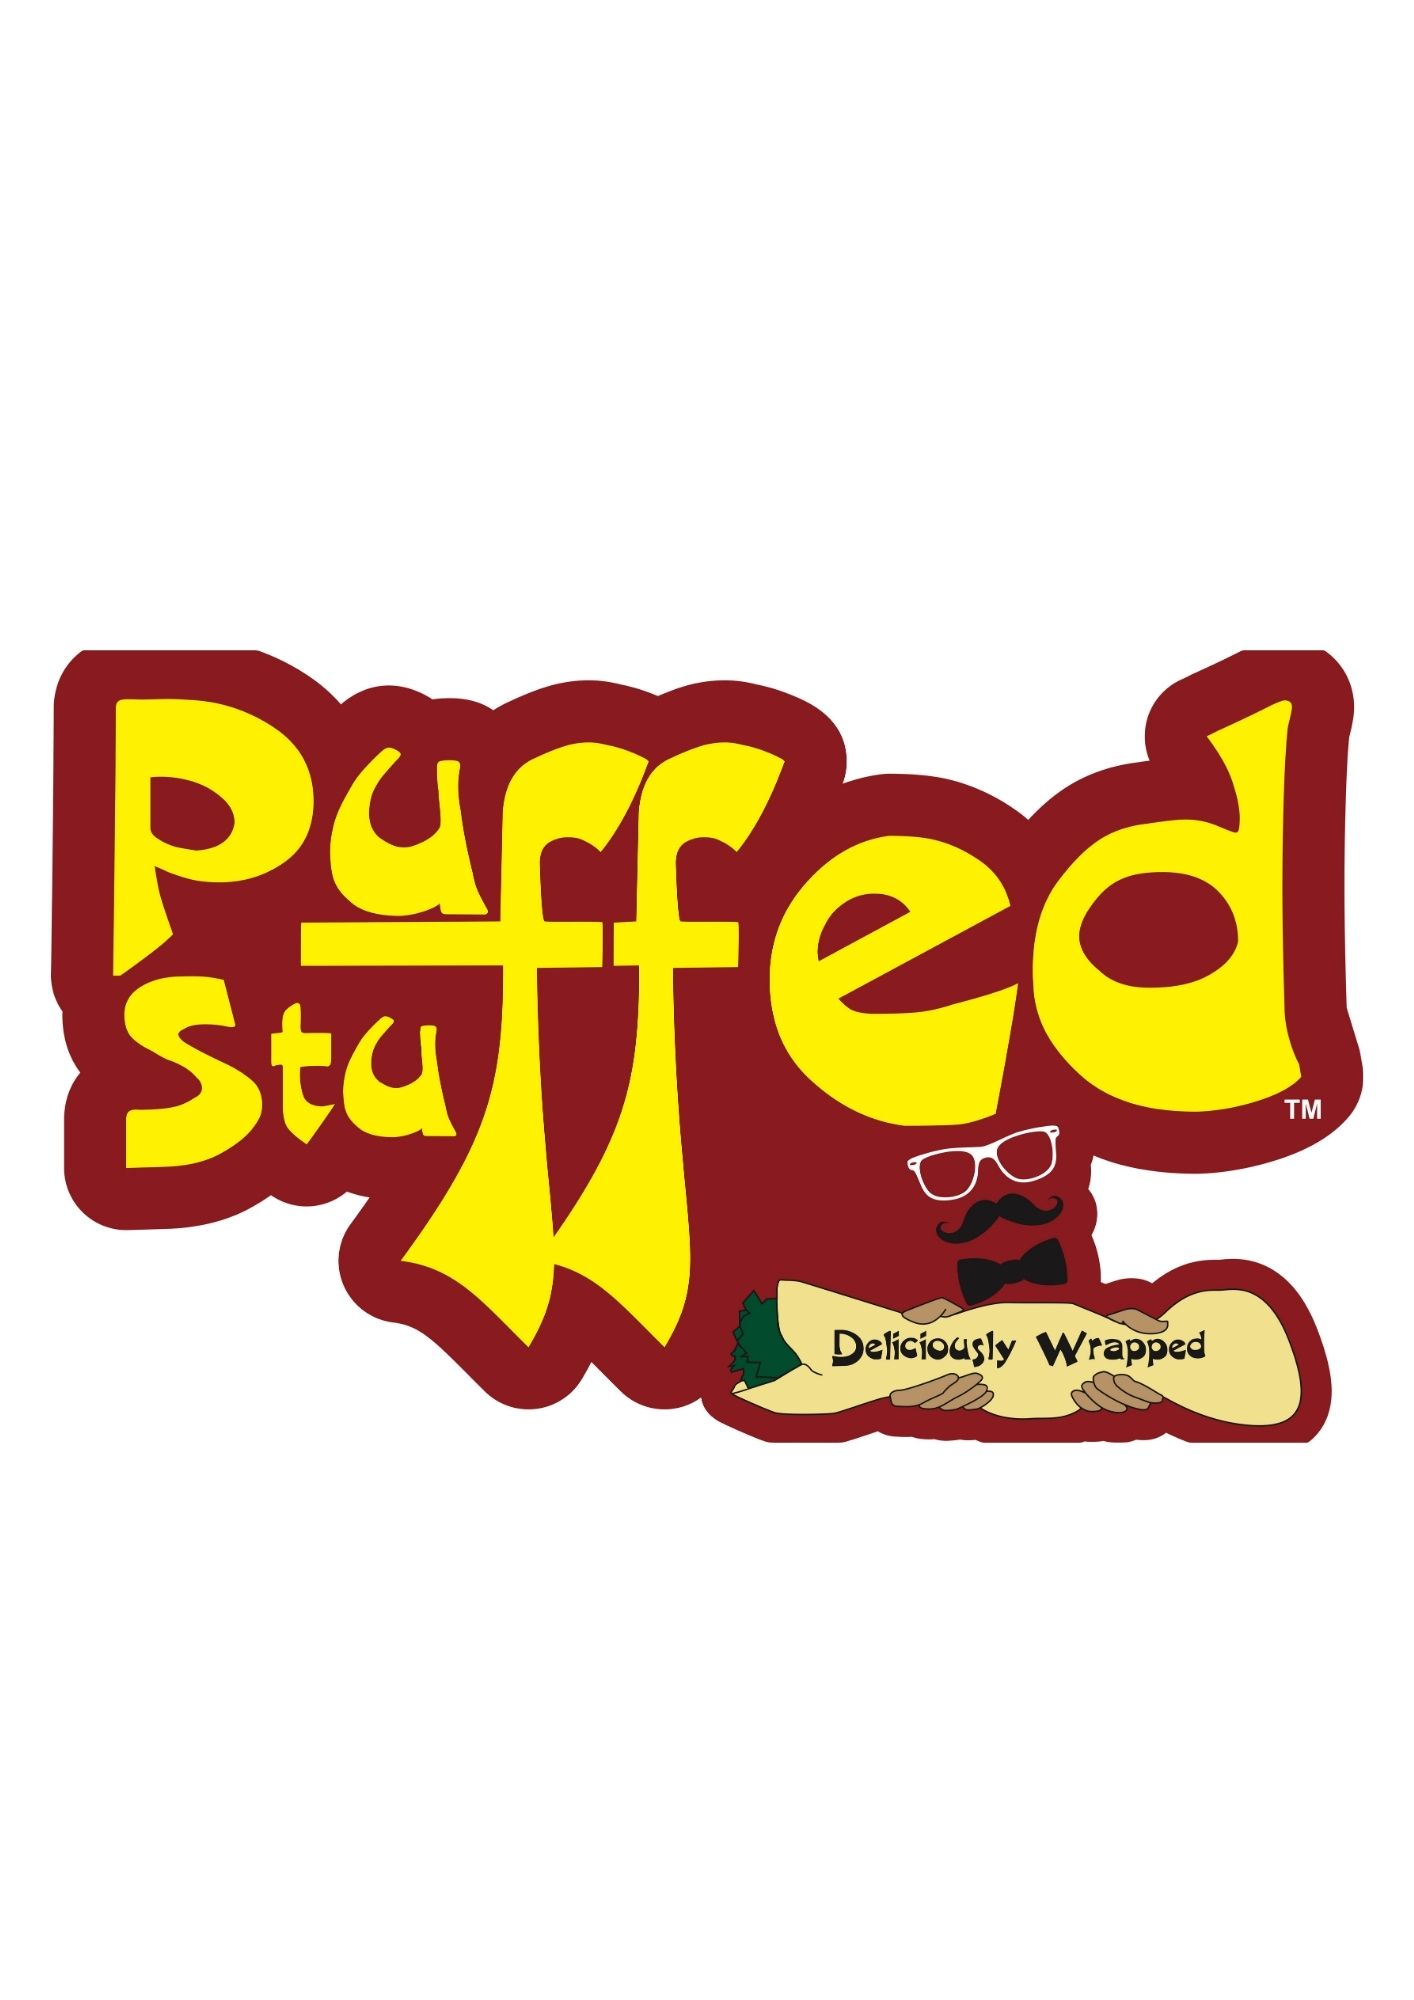 puffed stuffed